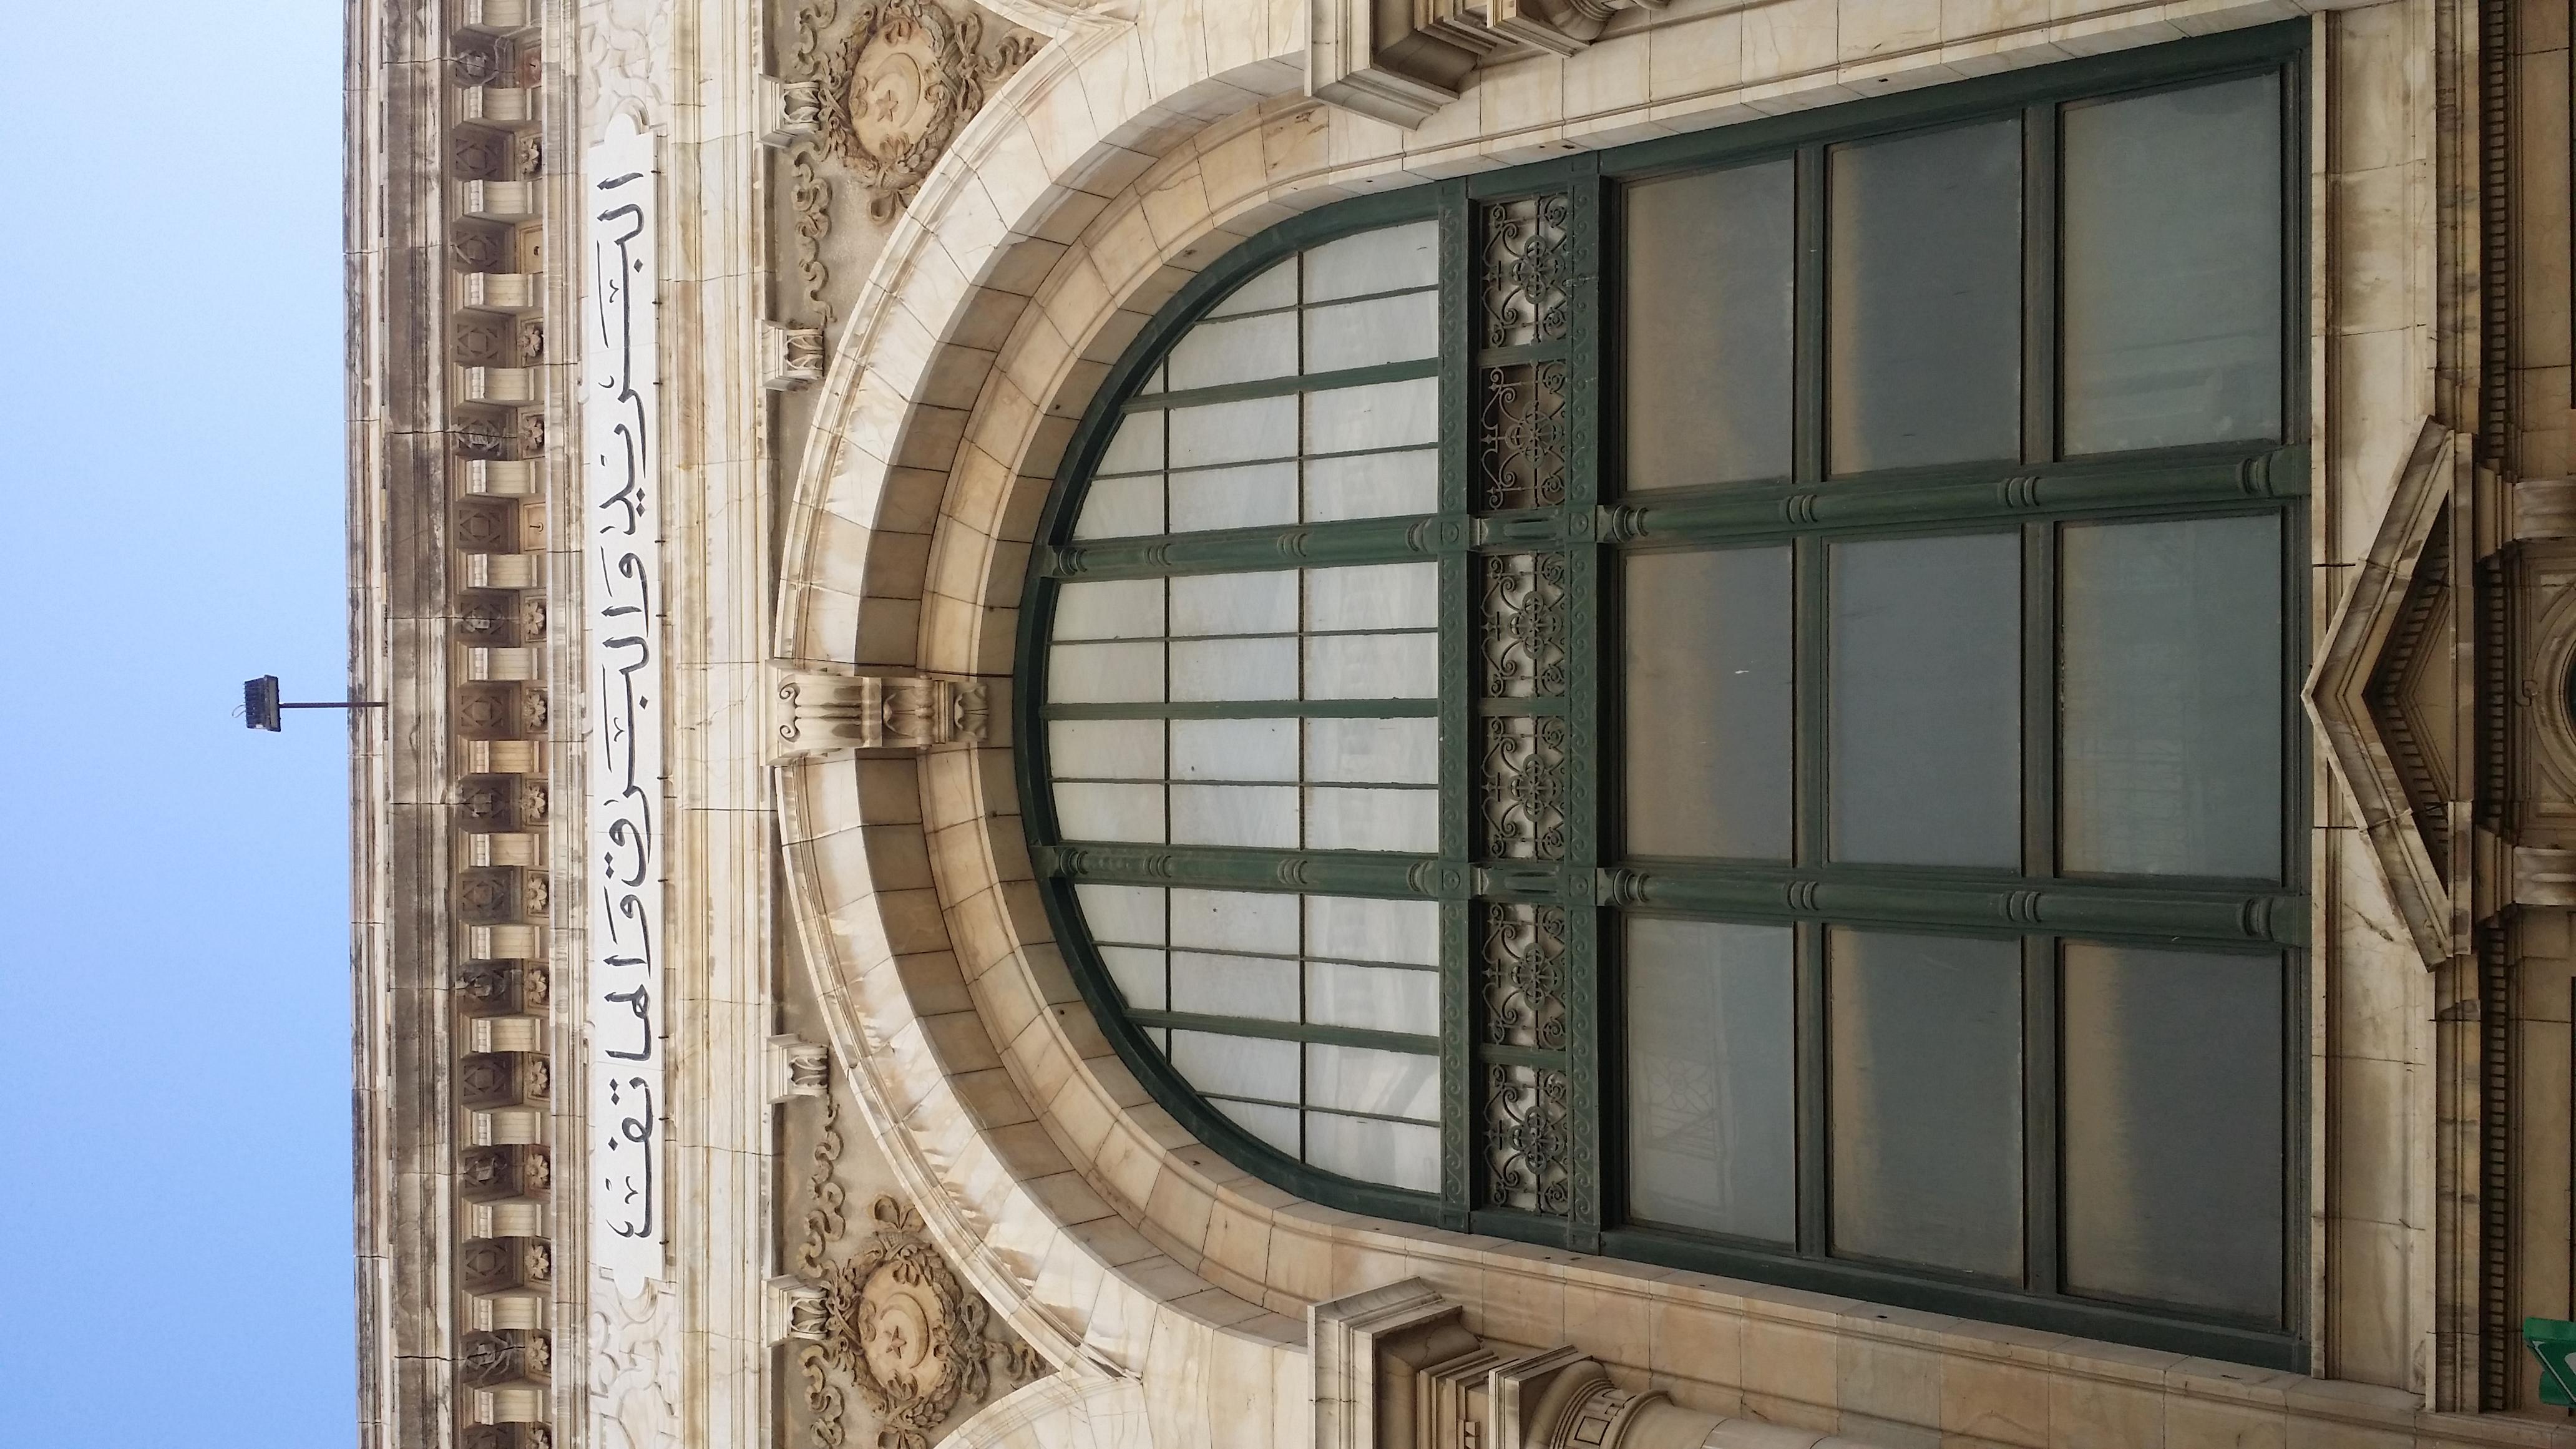 File:facade bureau de poste tunisienne.jpg wikimedia commons